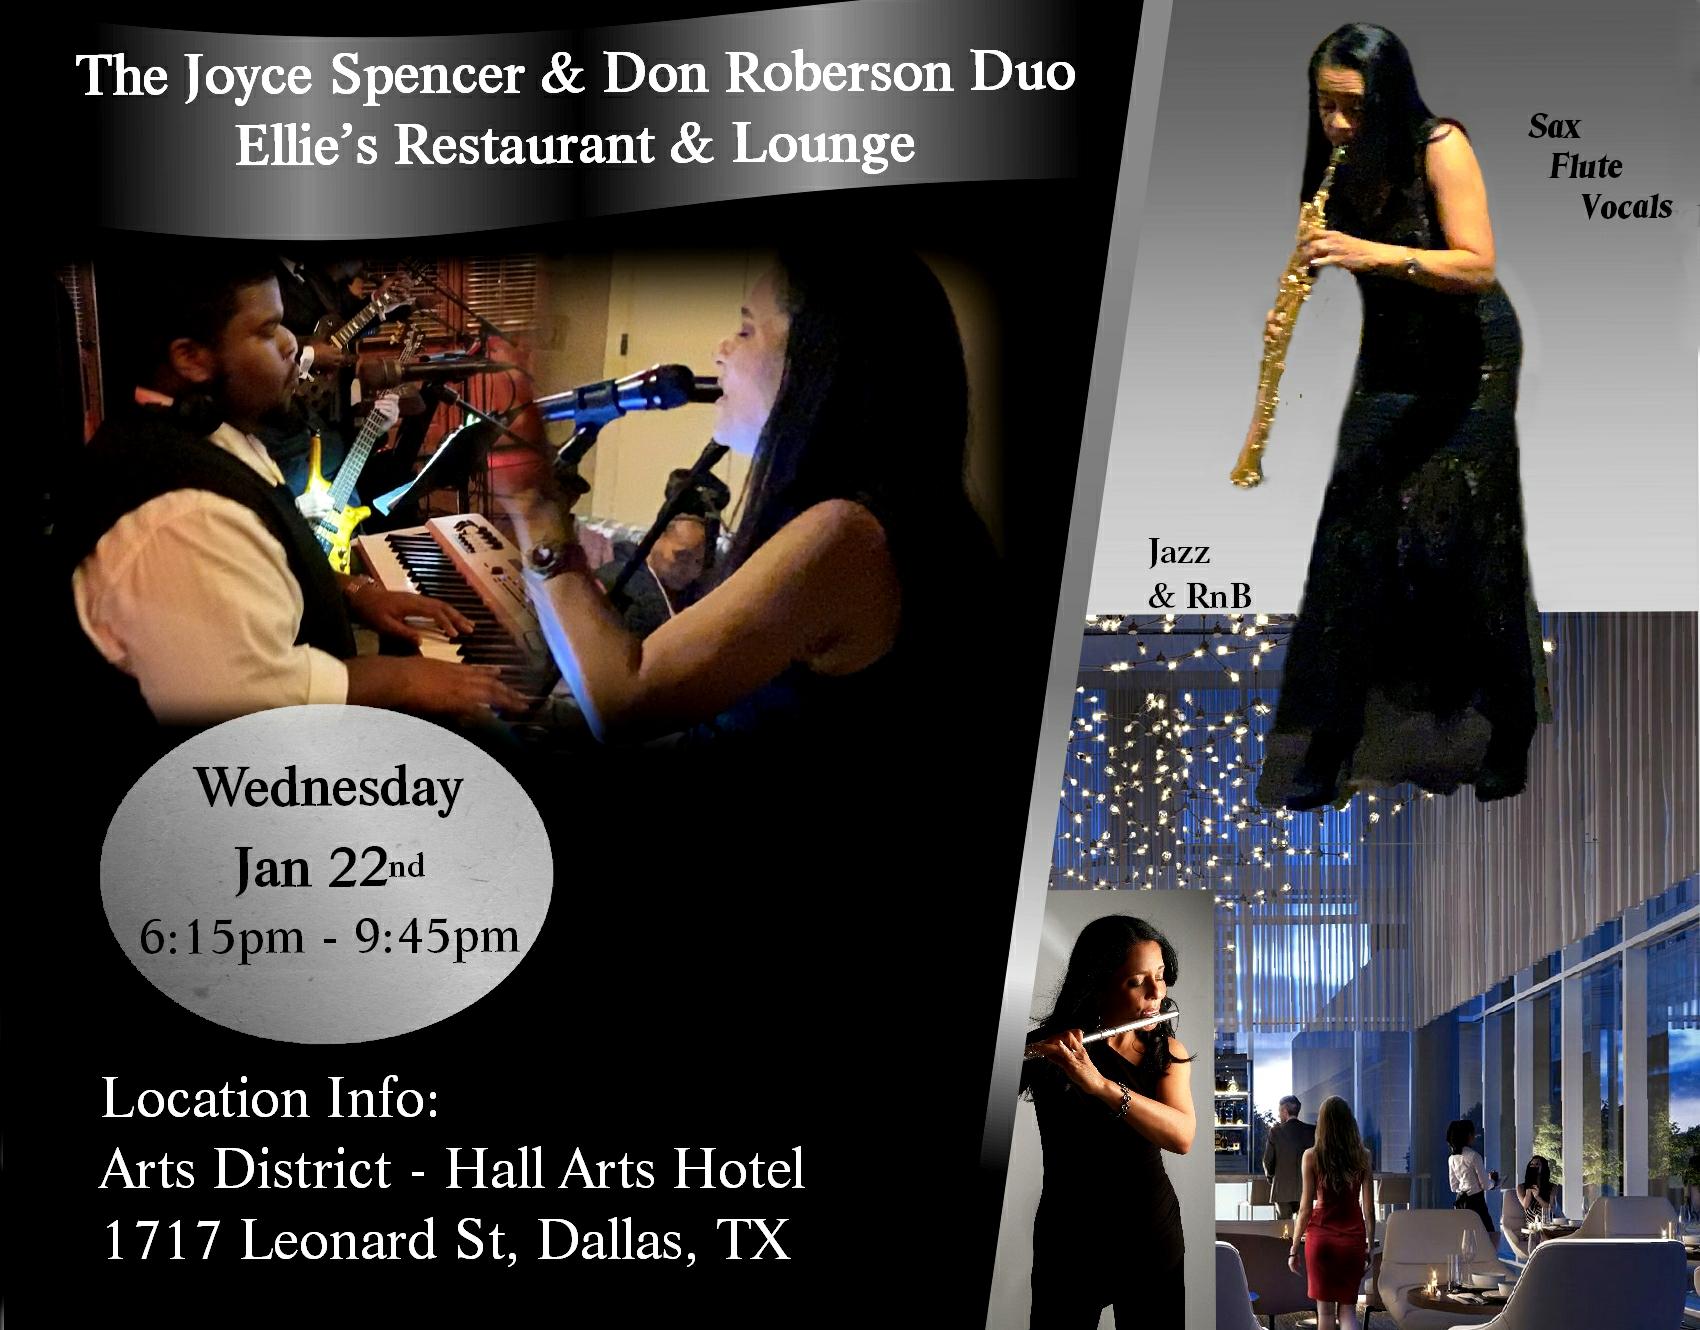 Joyce Spencer & Don Roberson Duo